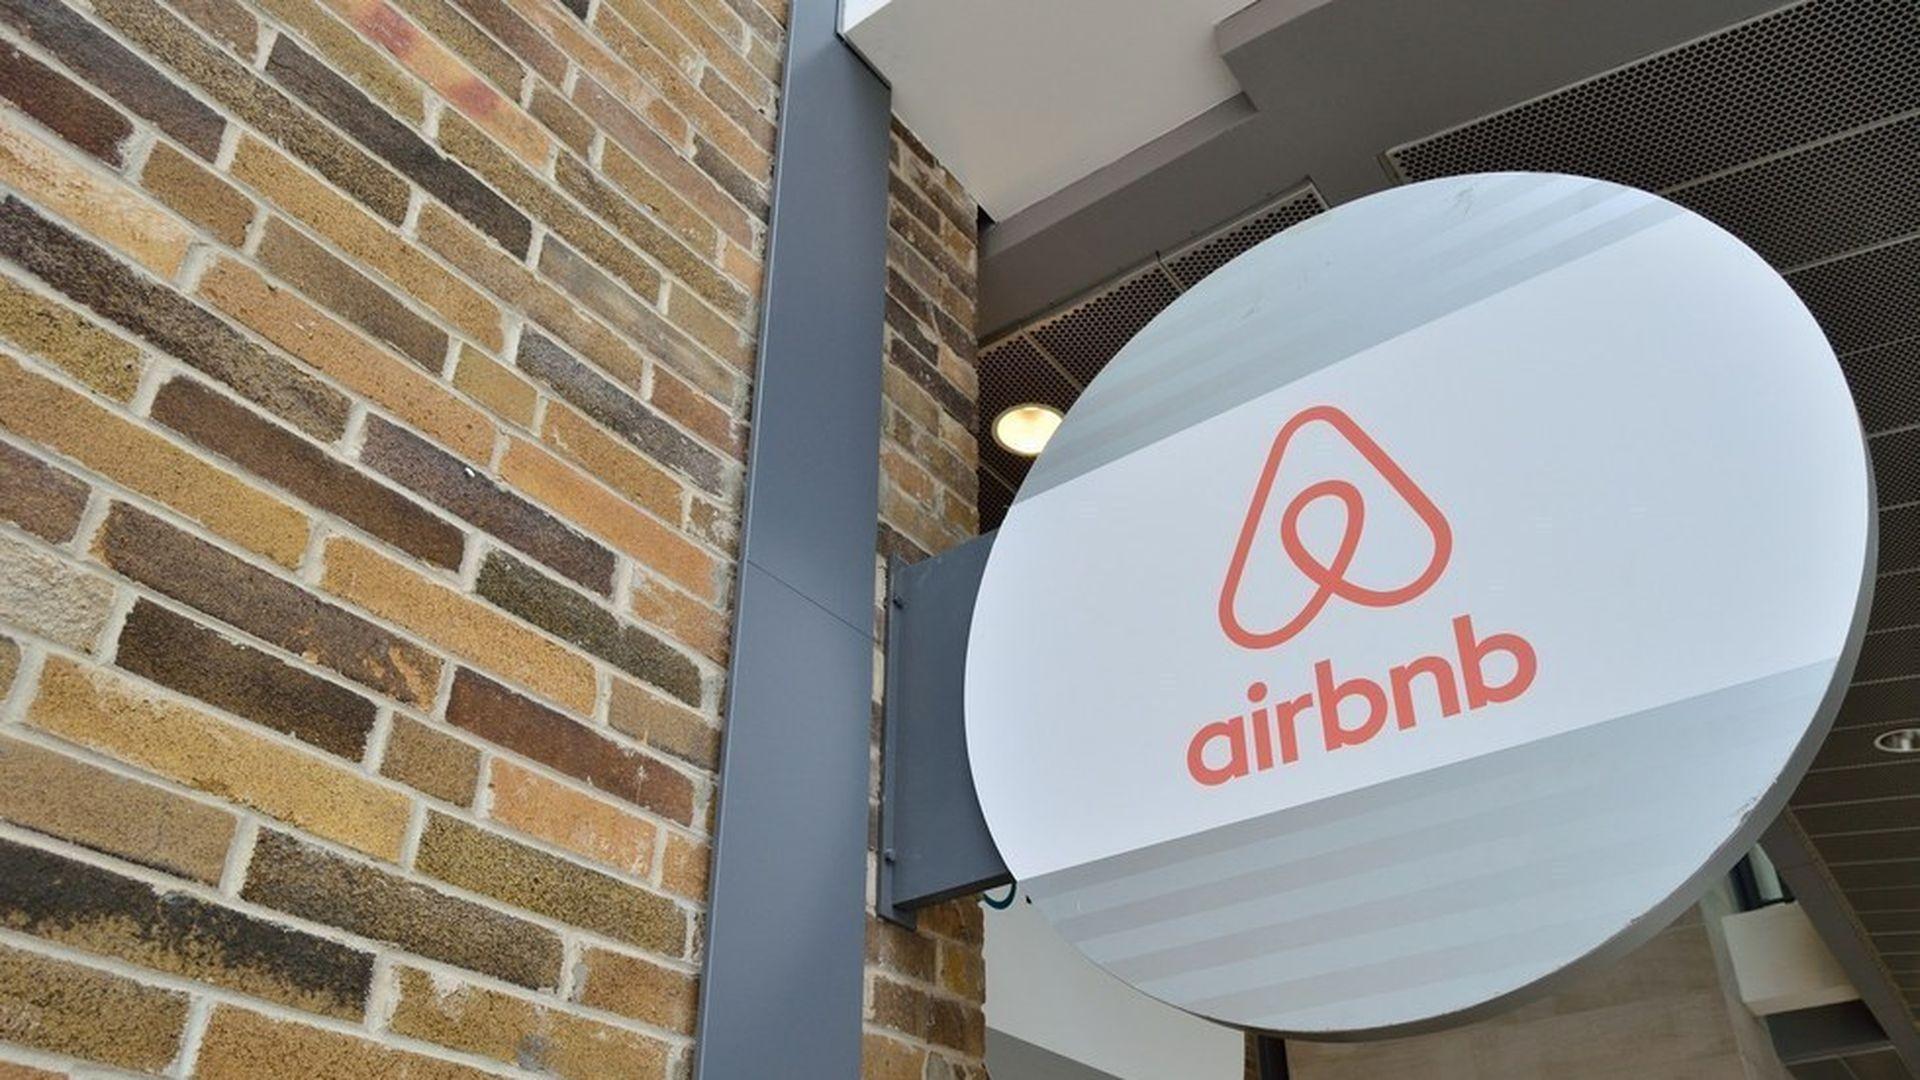 Airbnb looks at taking on Craigslist - Axios